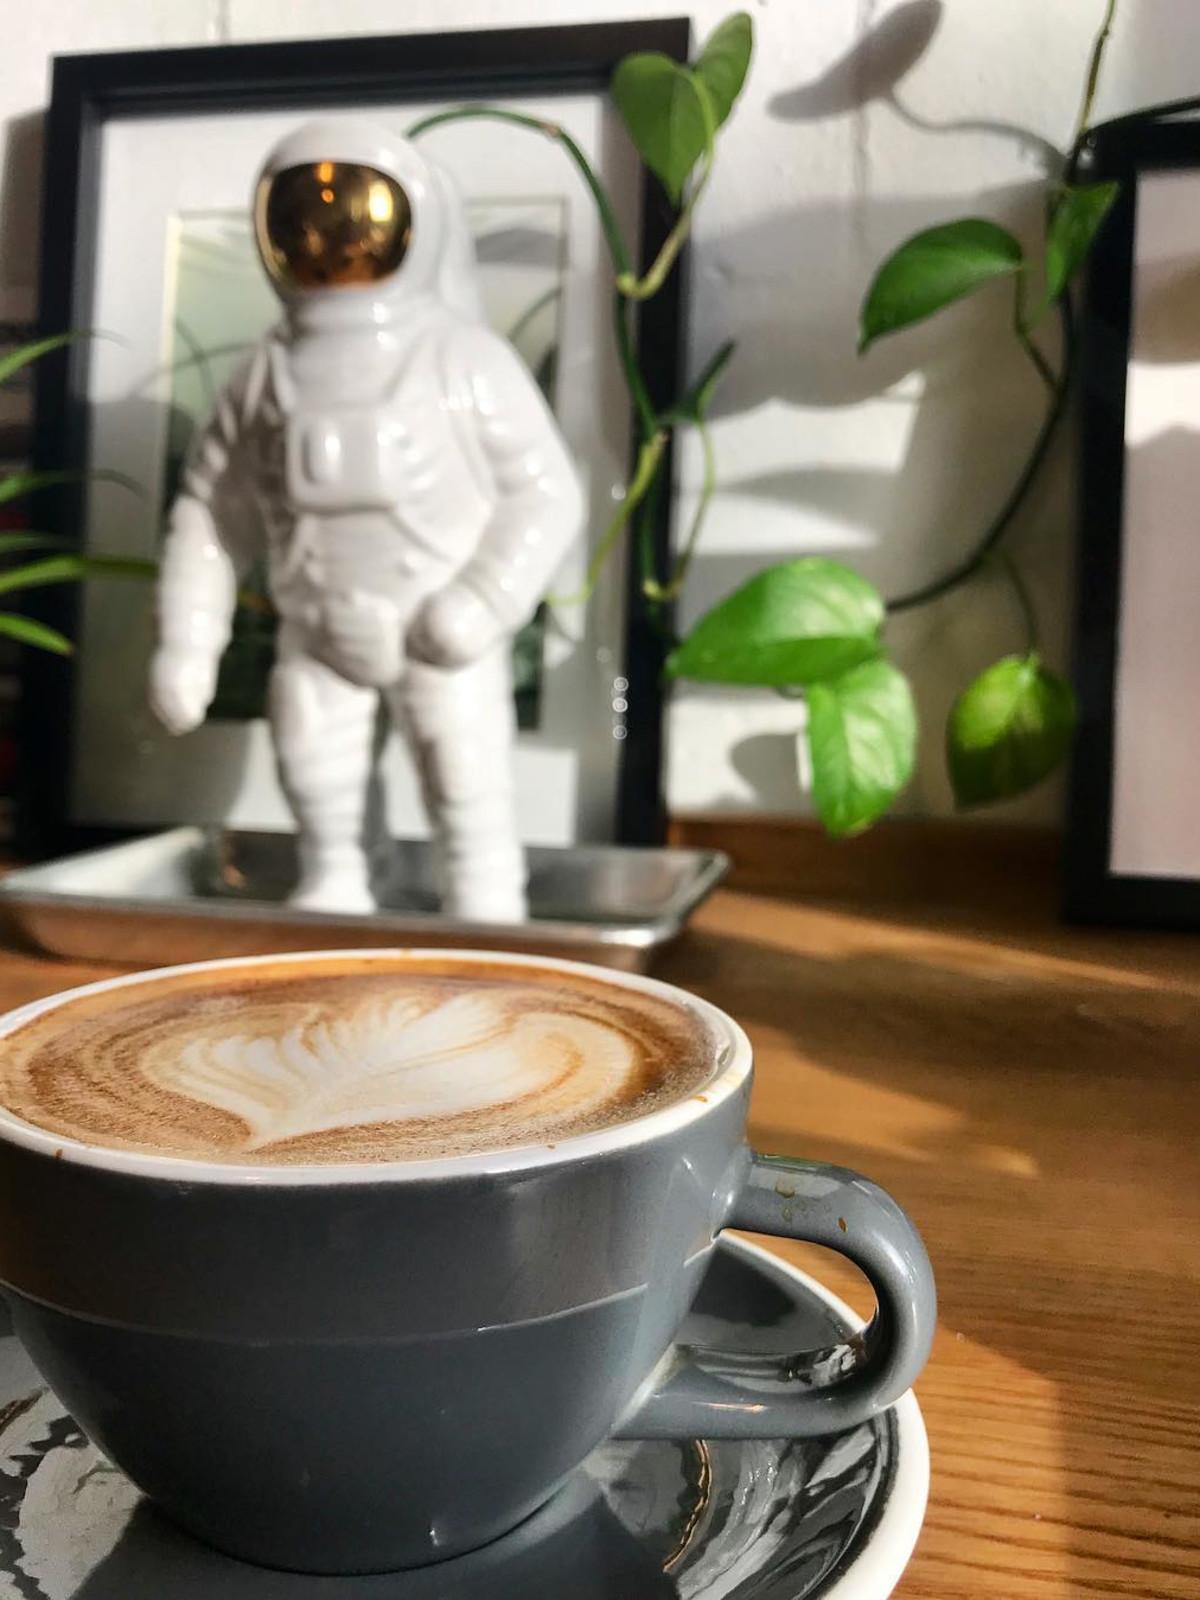 Giant Leap Coffee espresso